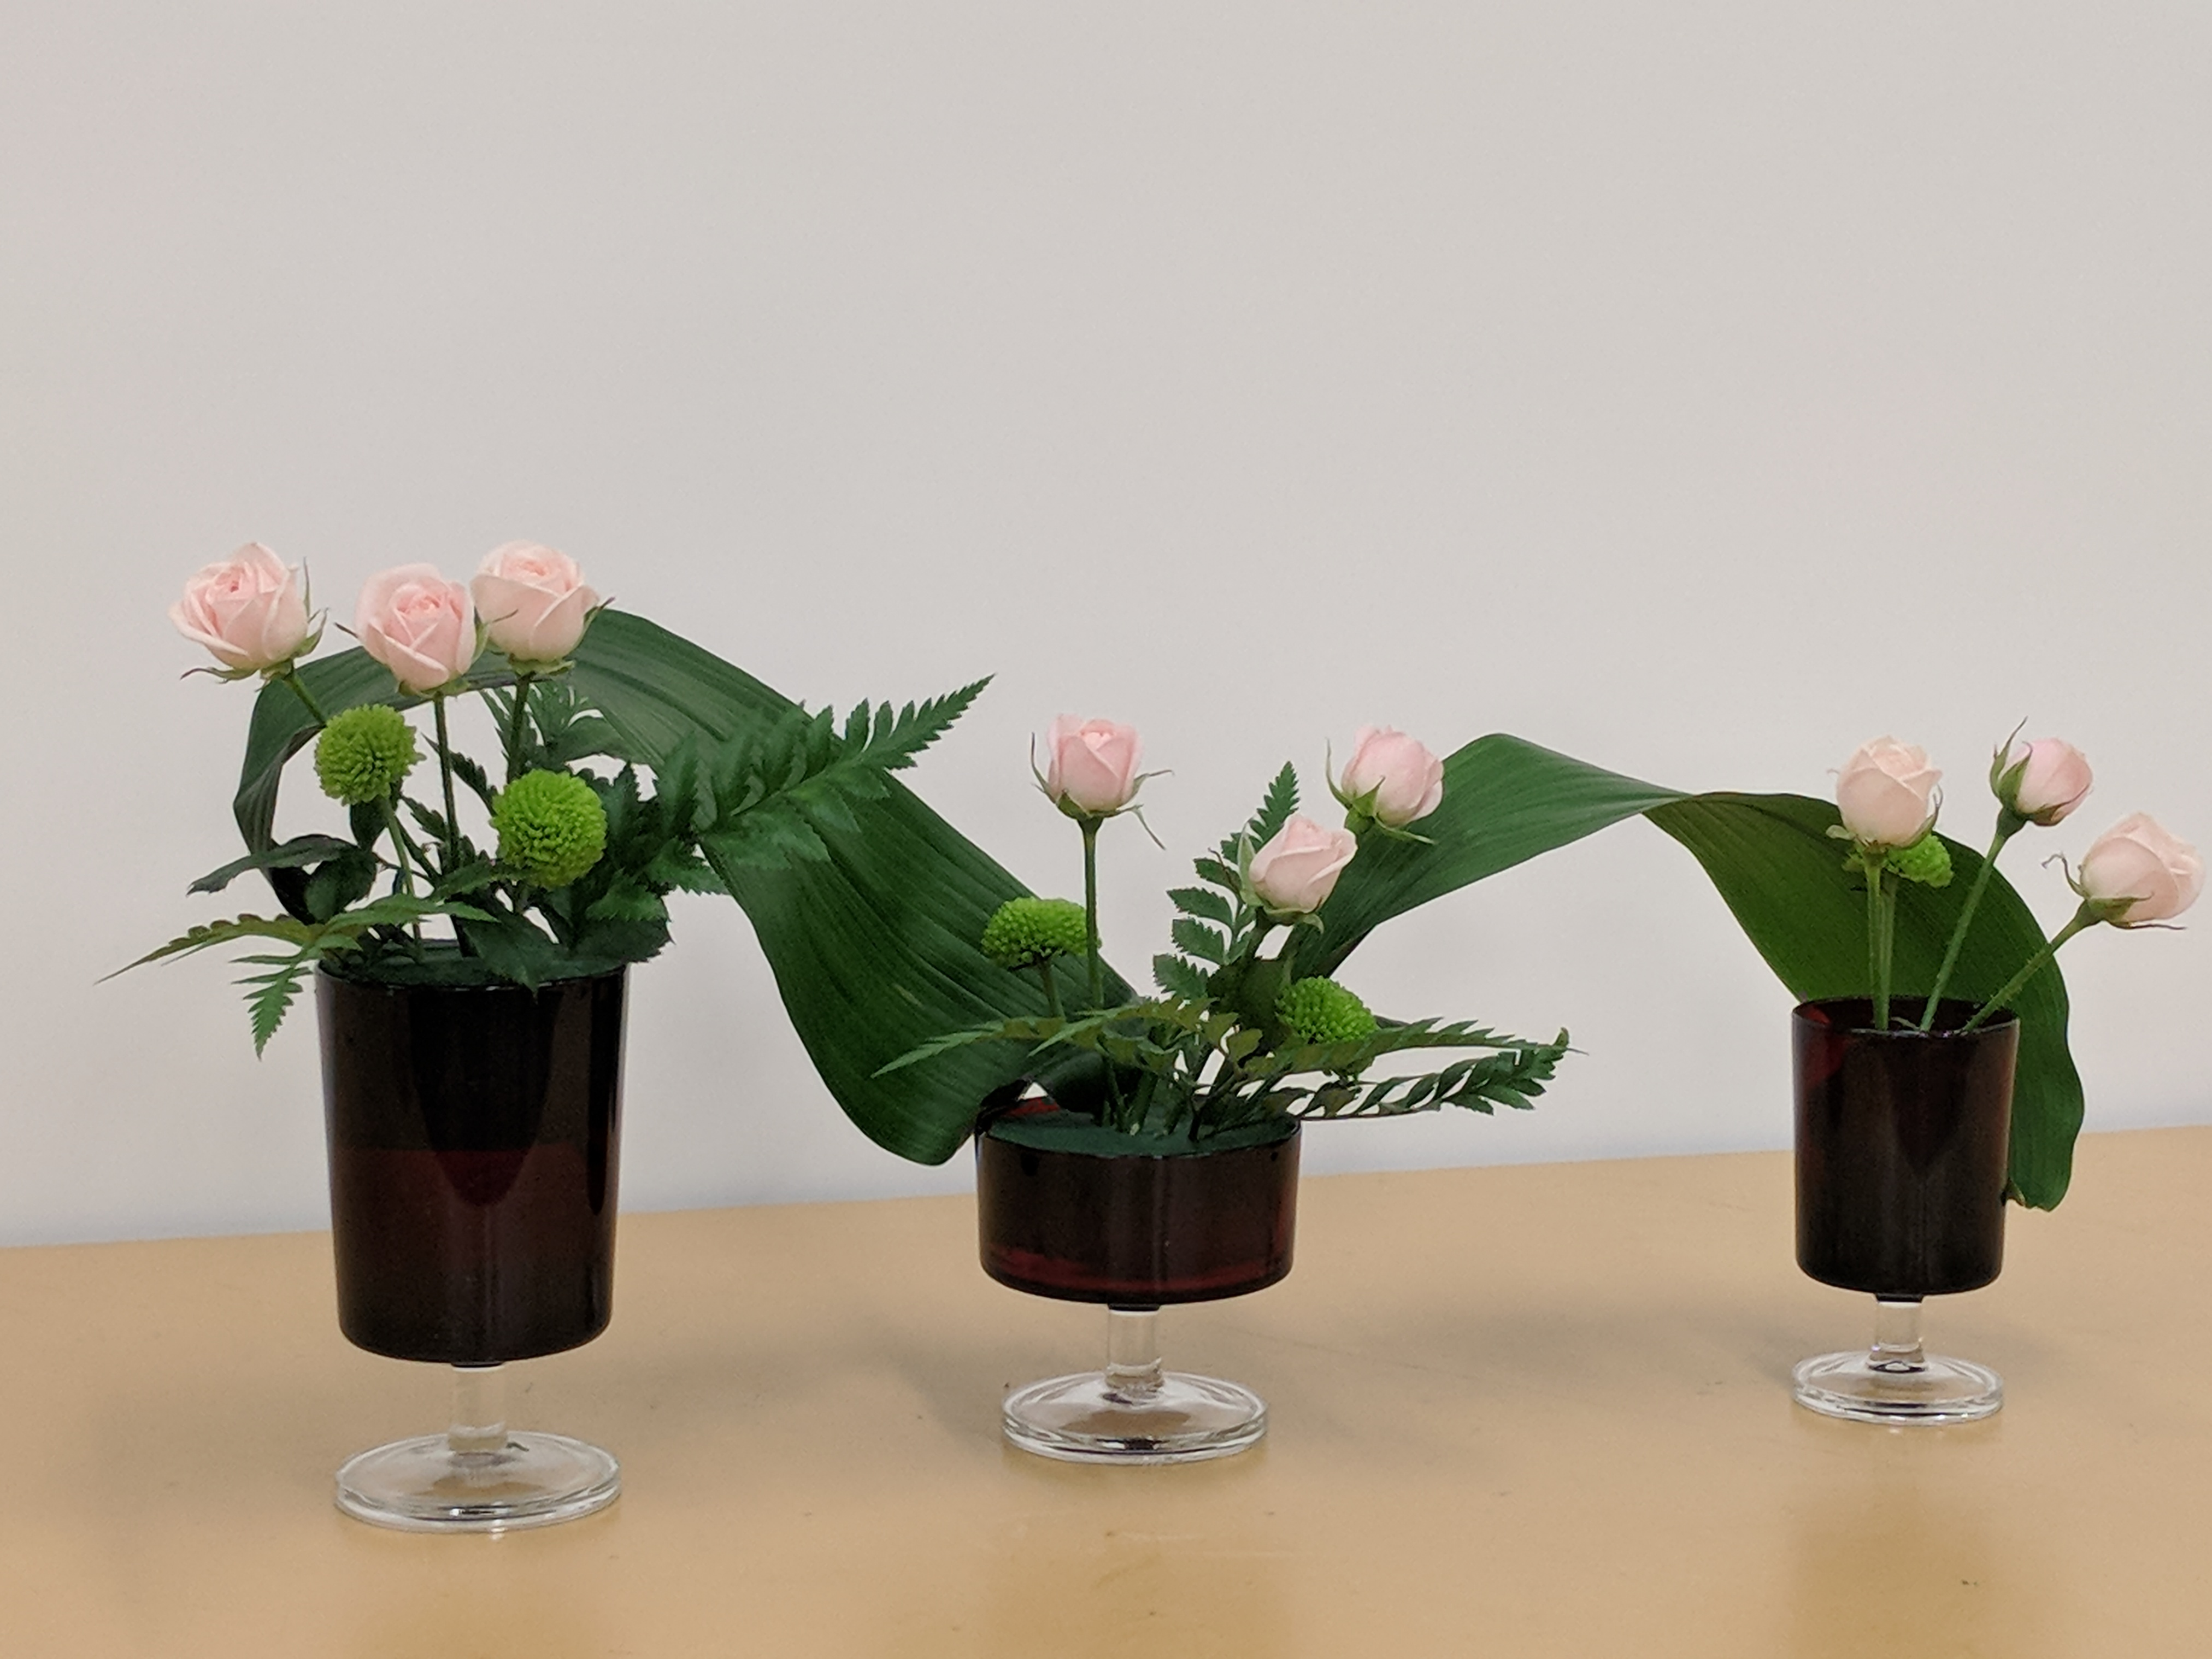 Creative Floral Design II